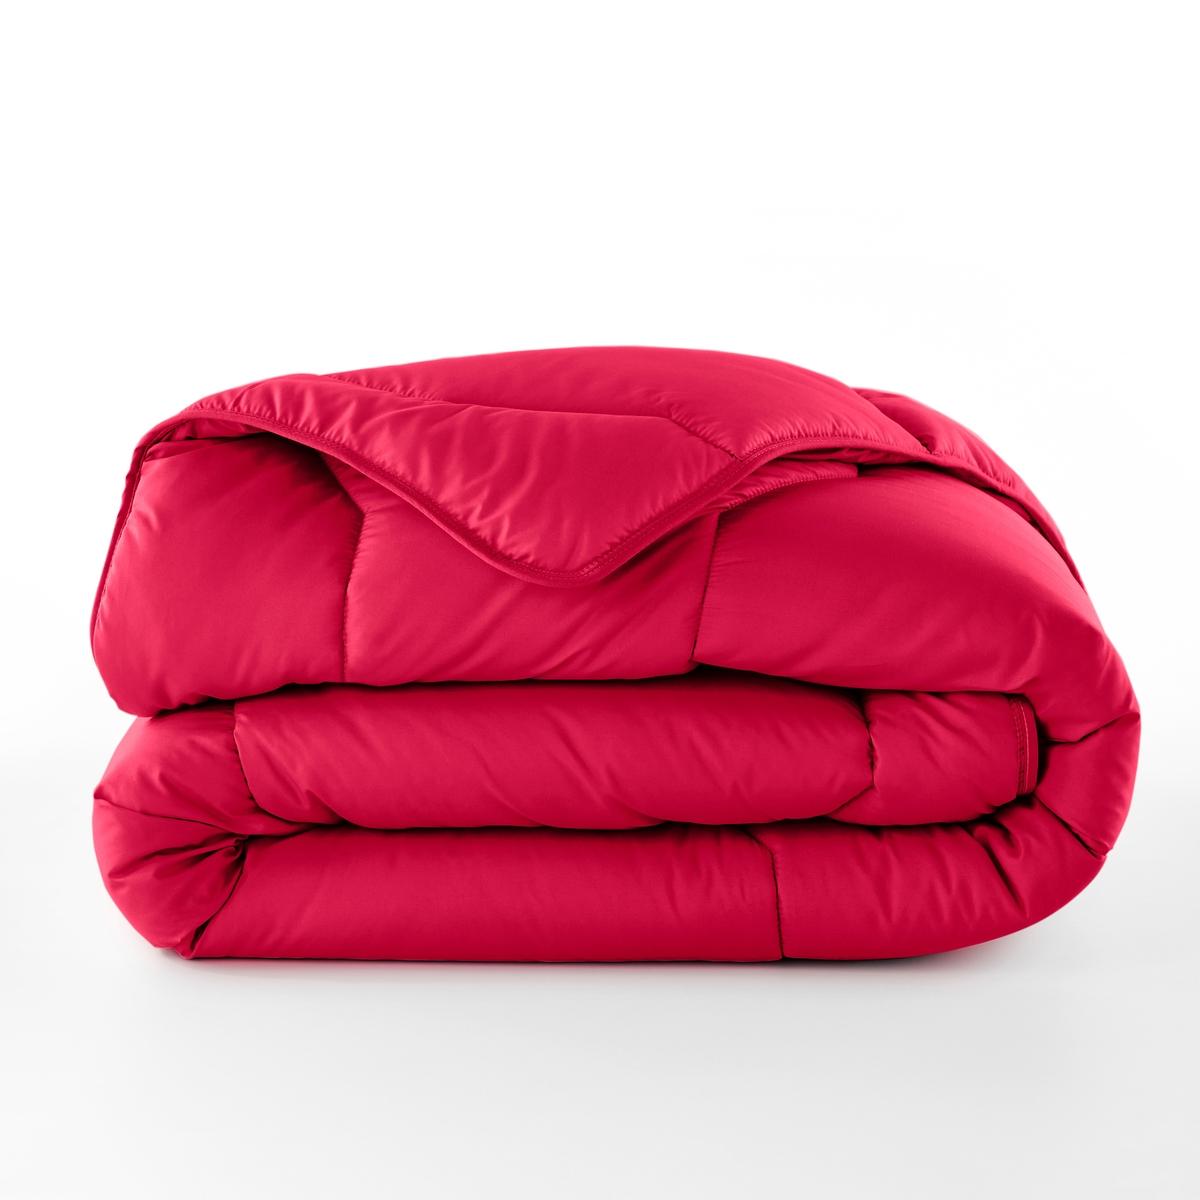 Одеяло La Redoute Из синтетики 175 гм 240 x 220 см красный